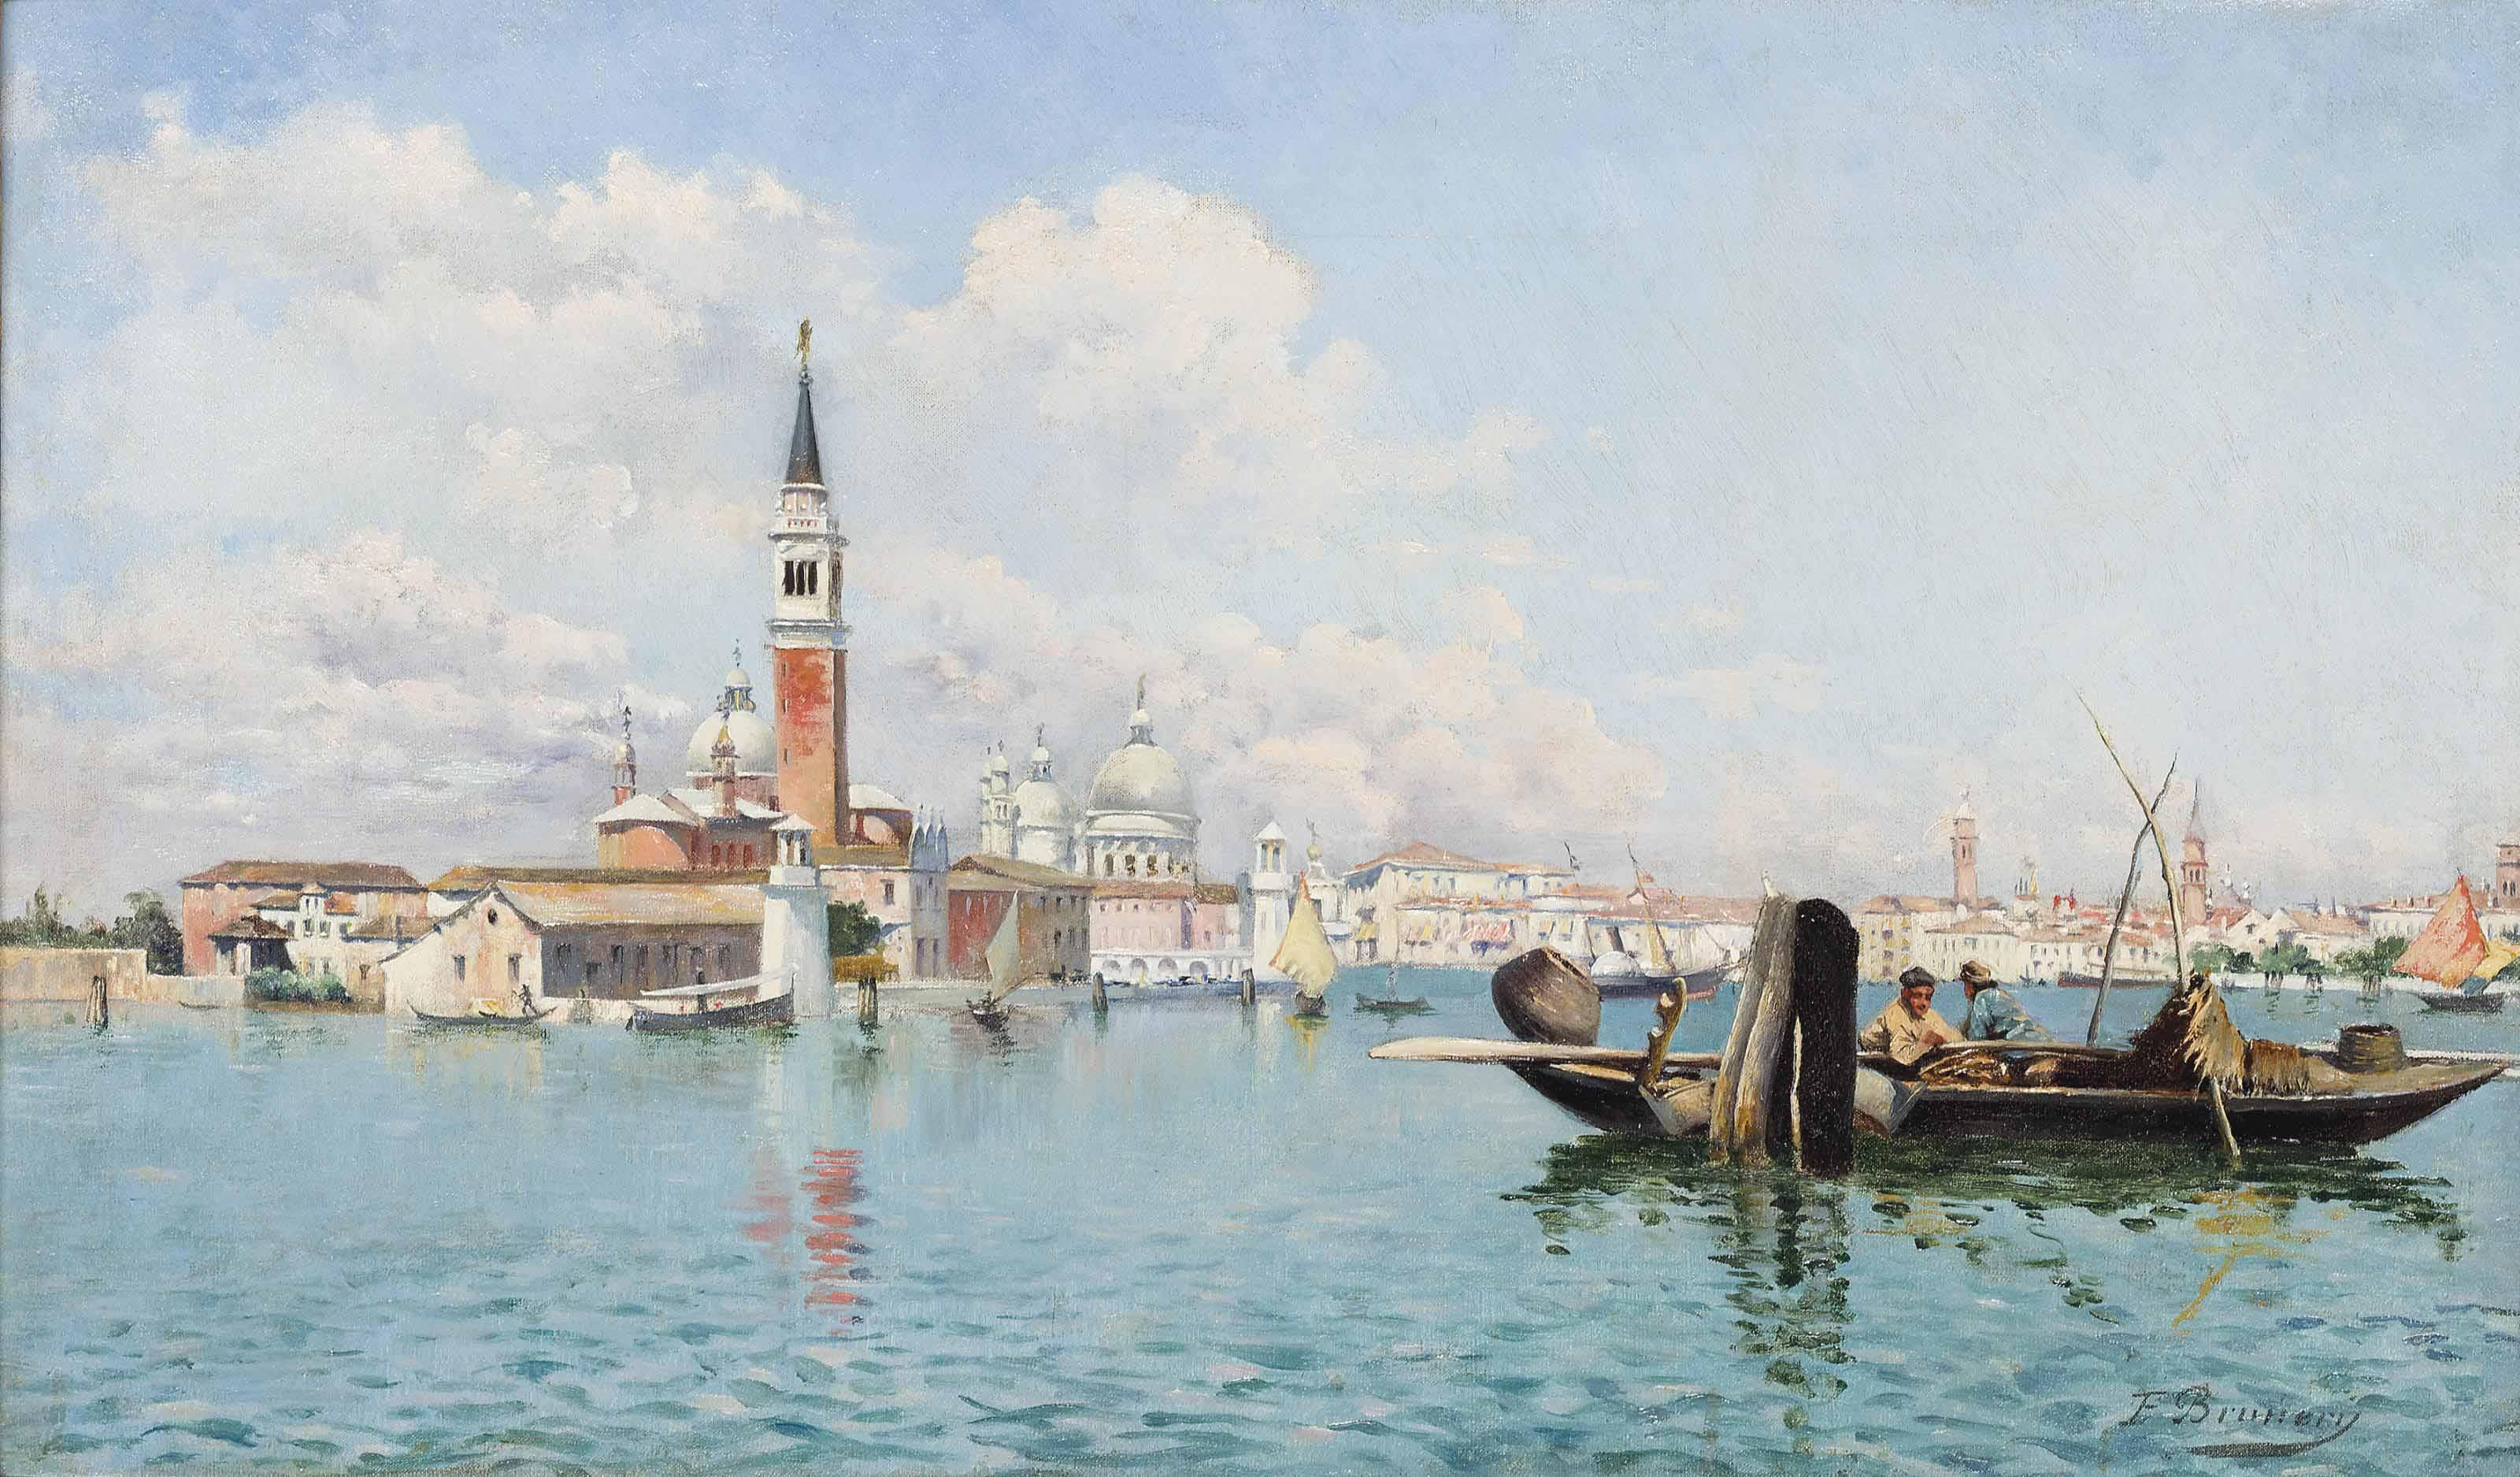 Fishing on the Venetian lagoon